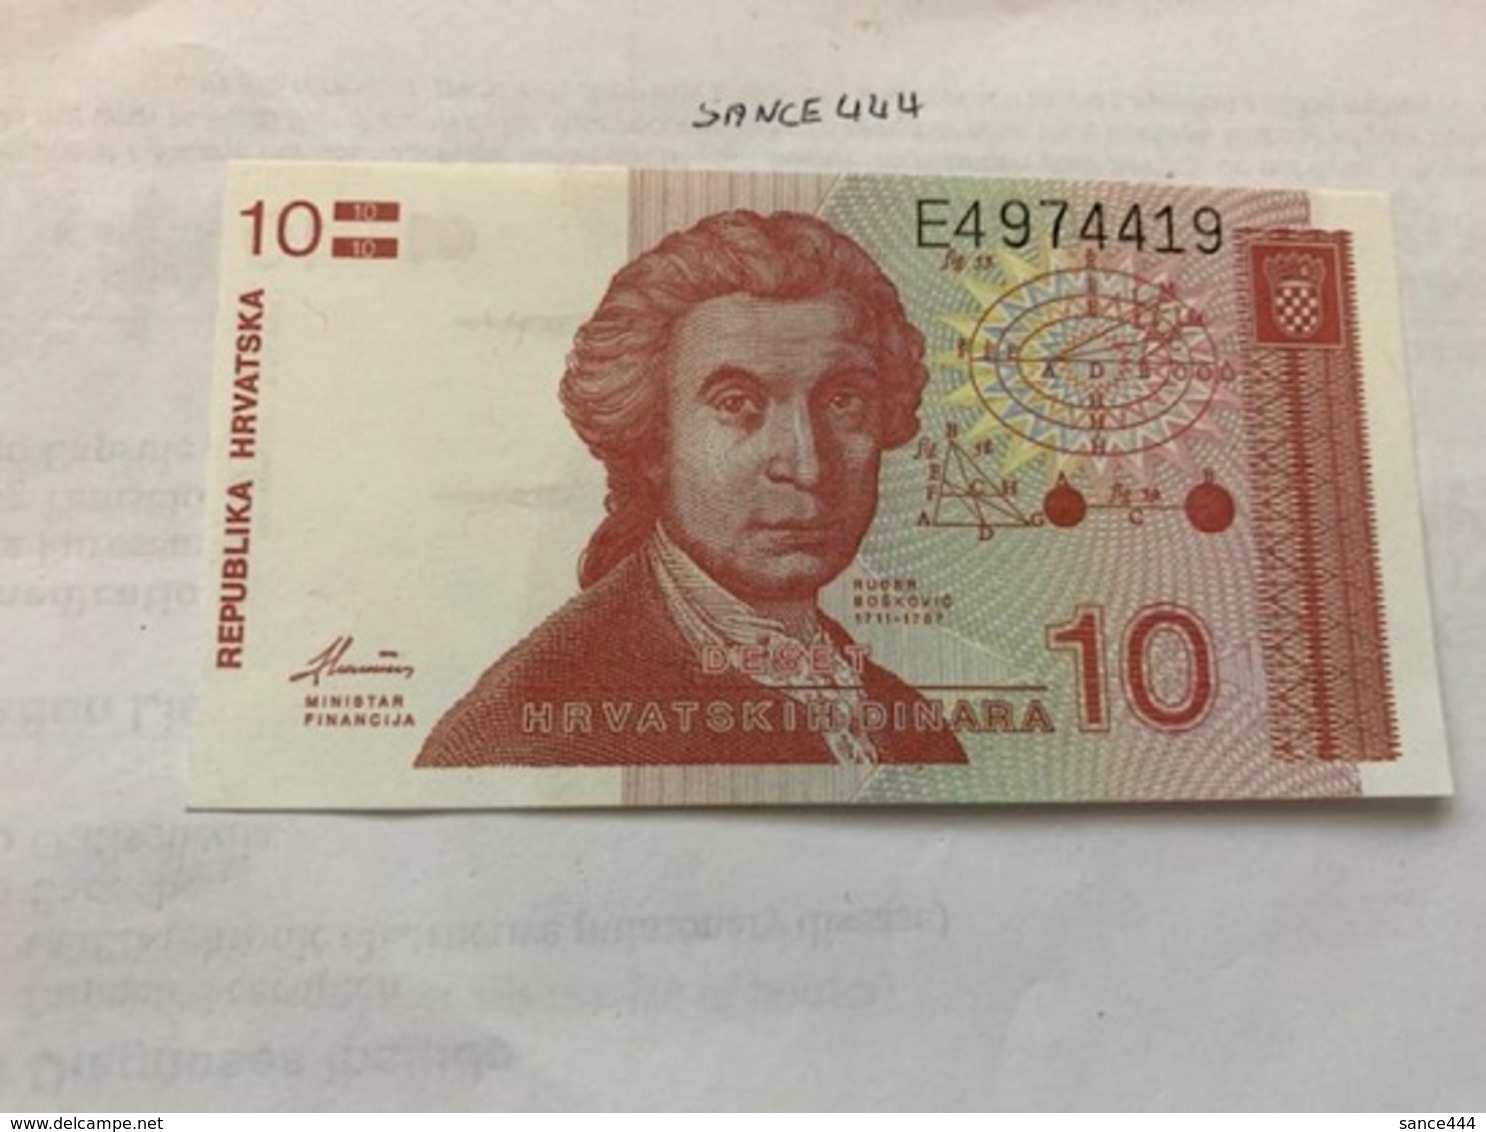 Croatia 10 Dinara Uncirculated 1991 Banknote - Croatia